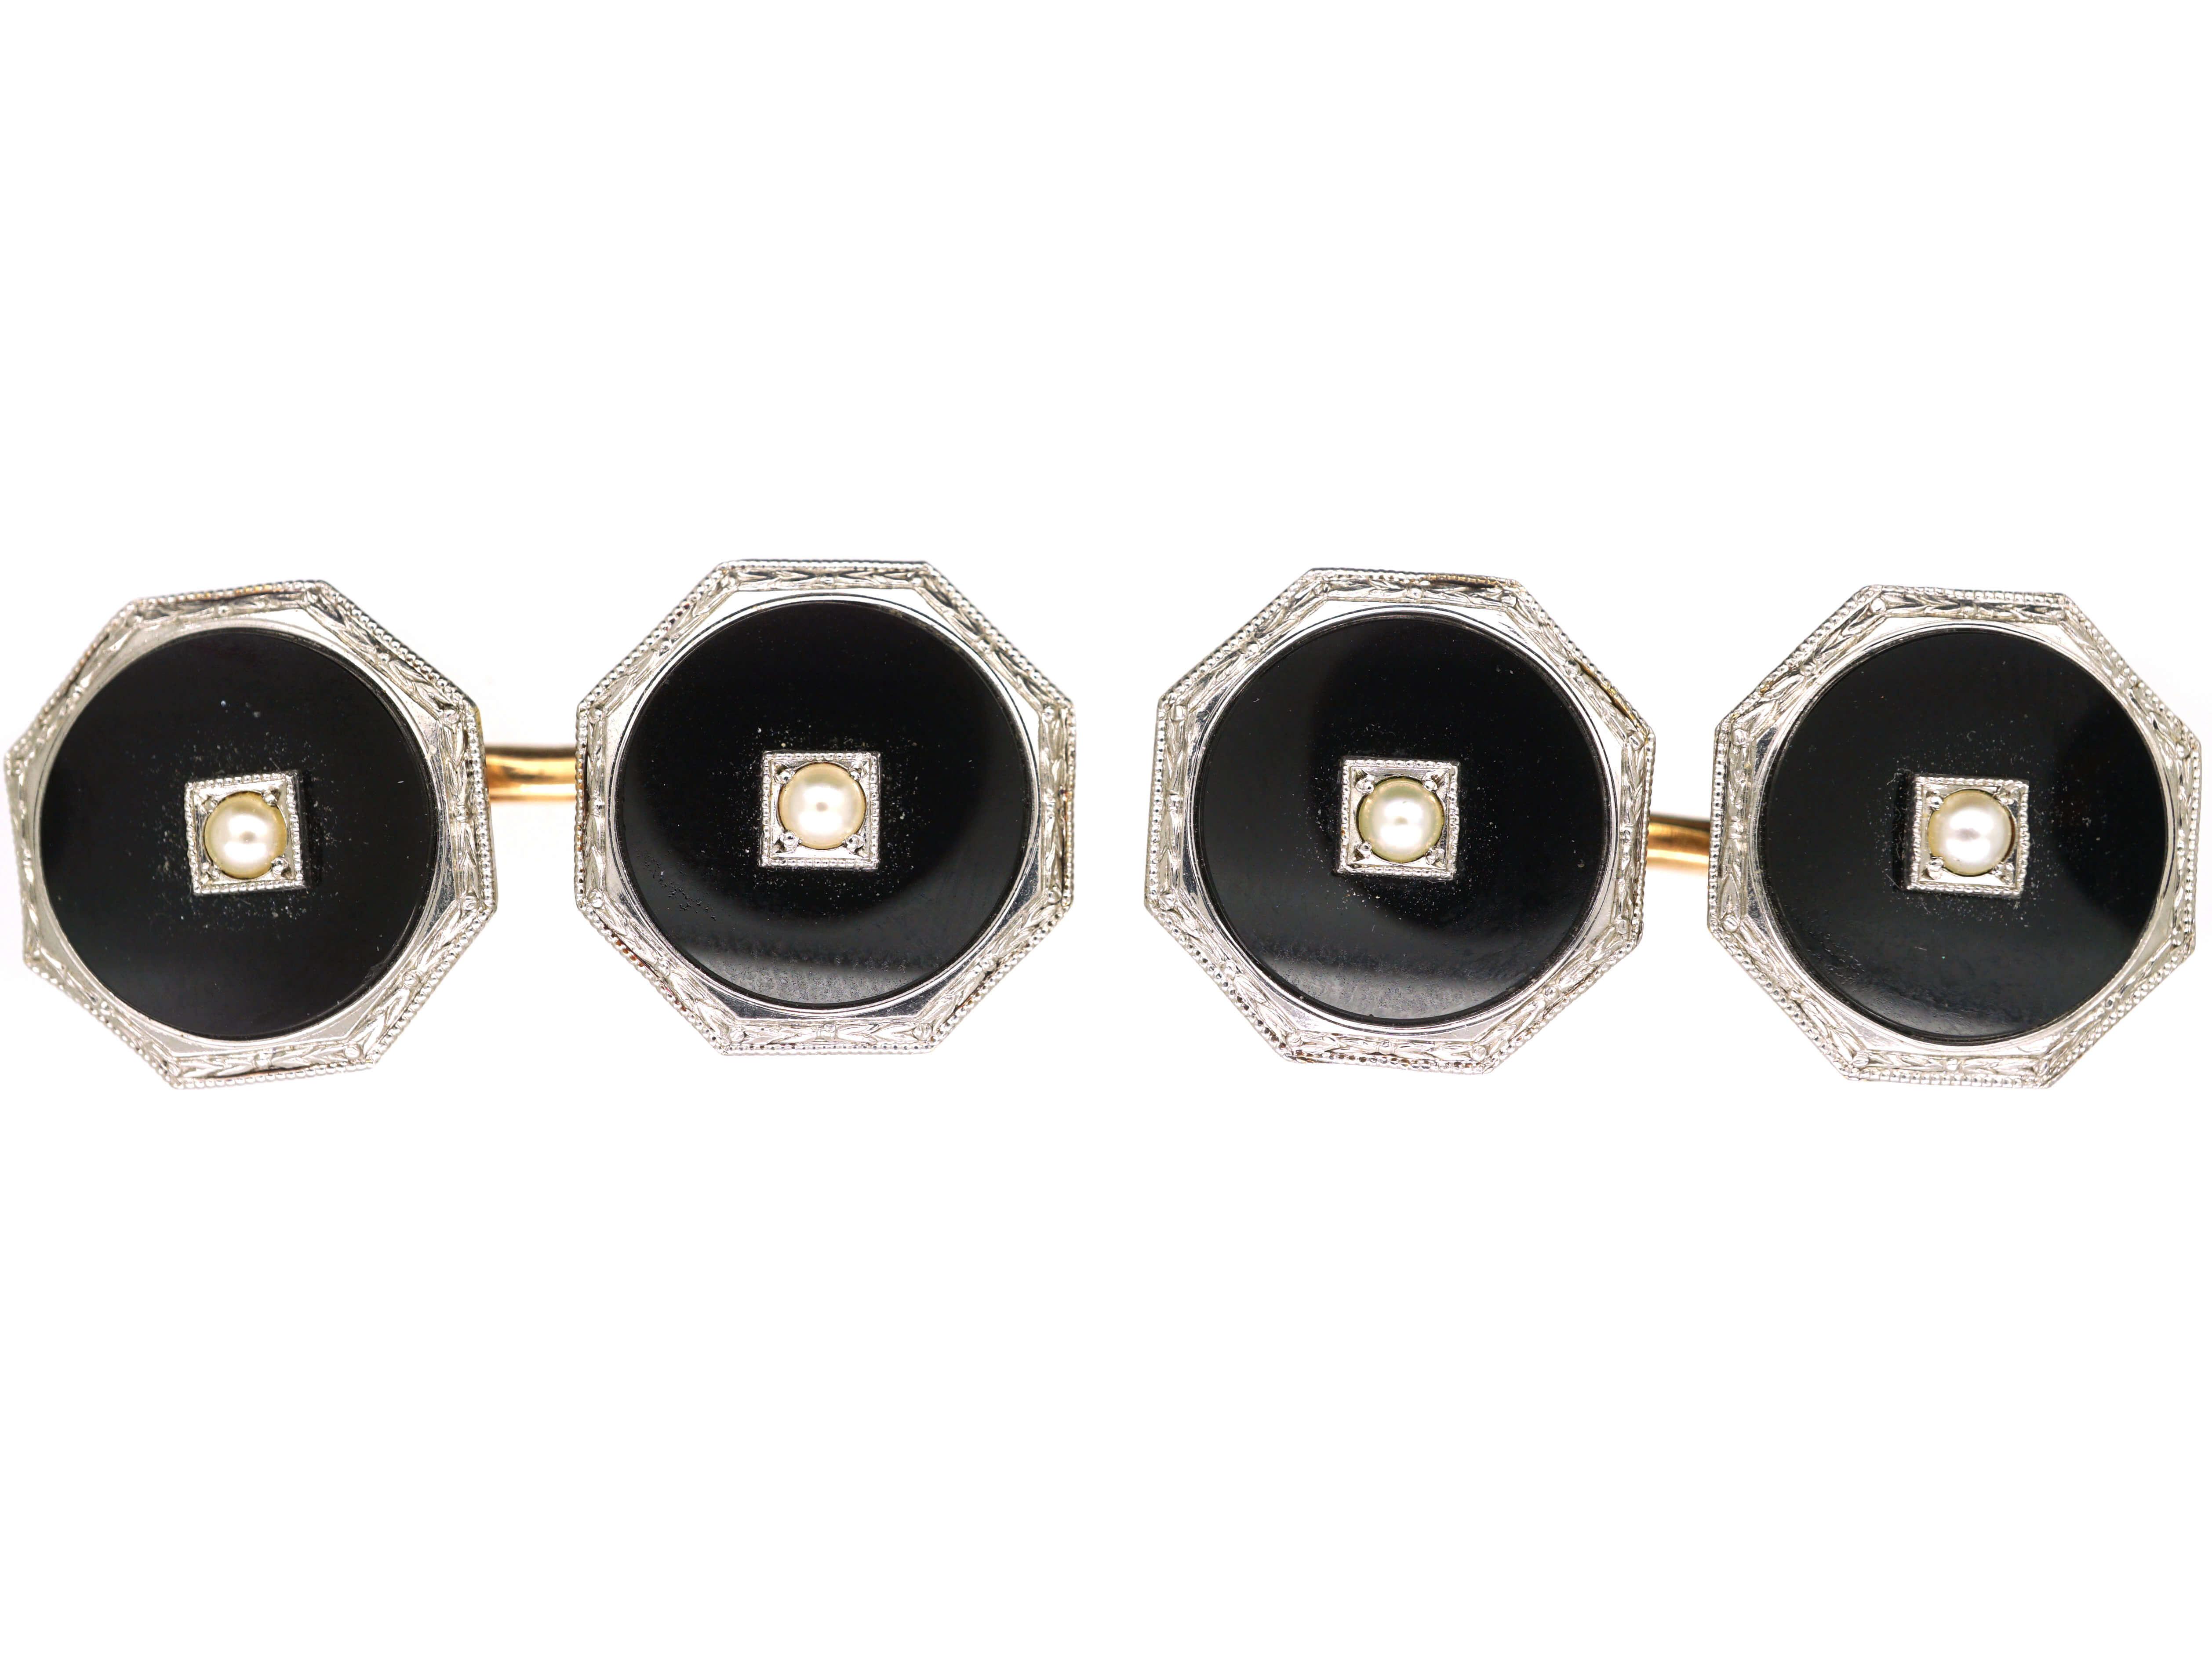 Art Deco 14ct Gold, Onyx & Natural Split Pearl Octagonal Cufflinks